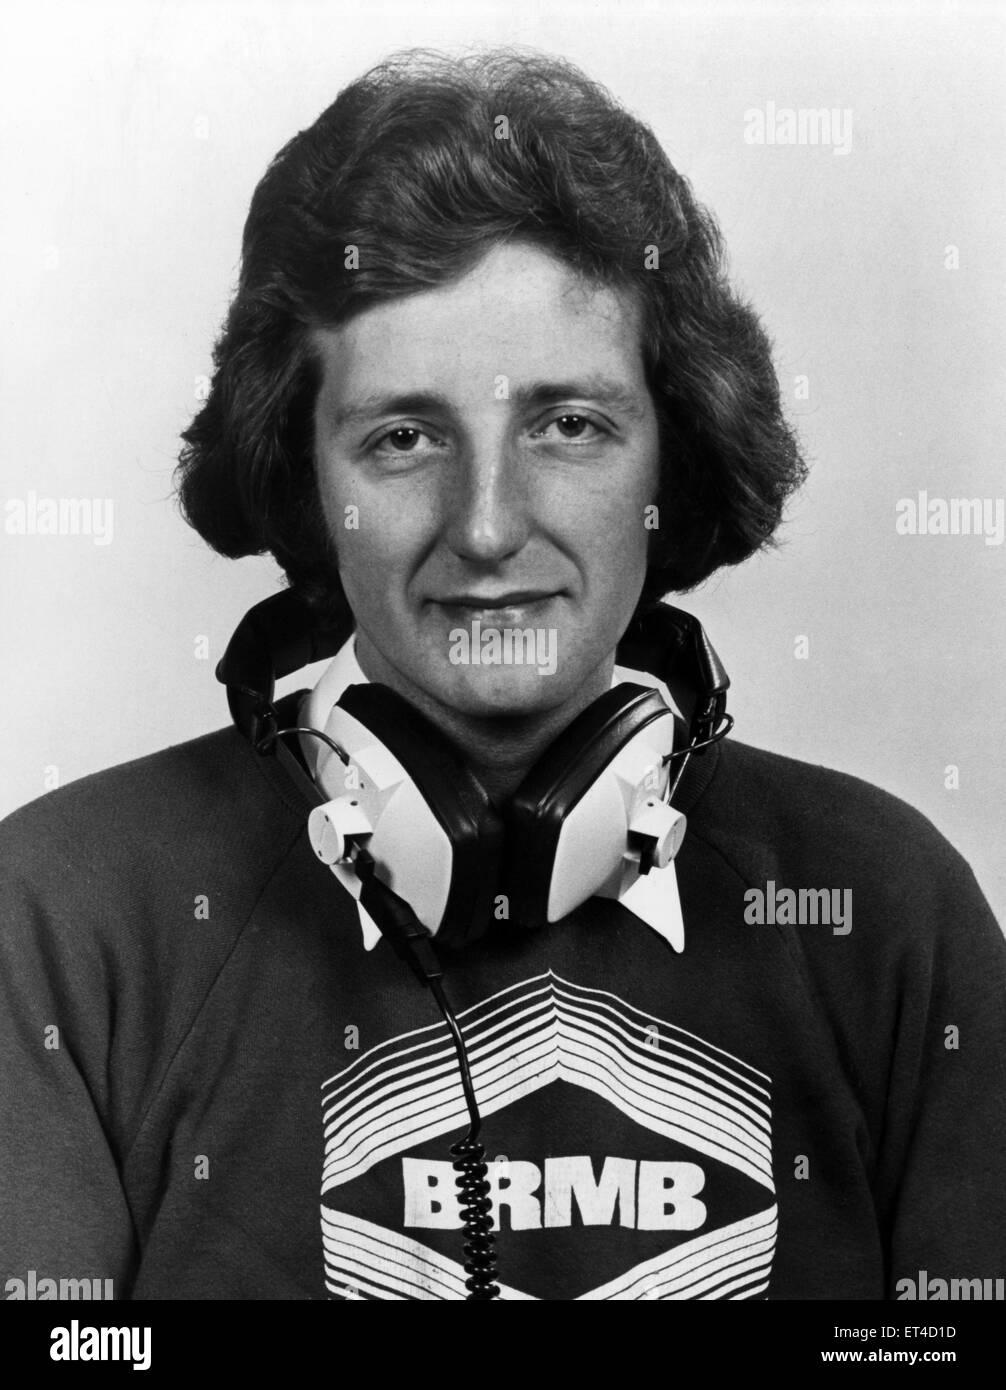 Nicky Steele Brmb Radio Presenter Circa 1975